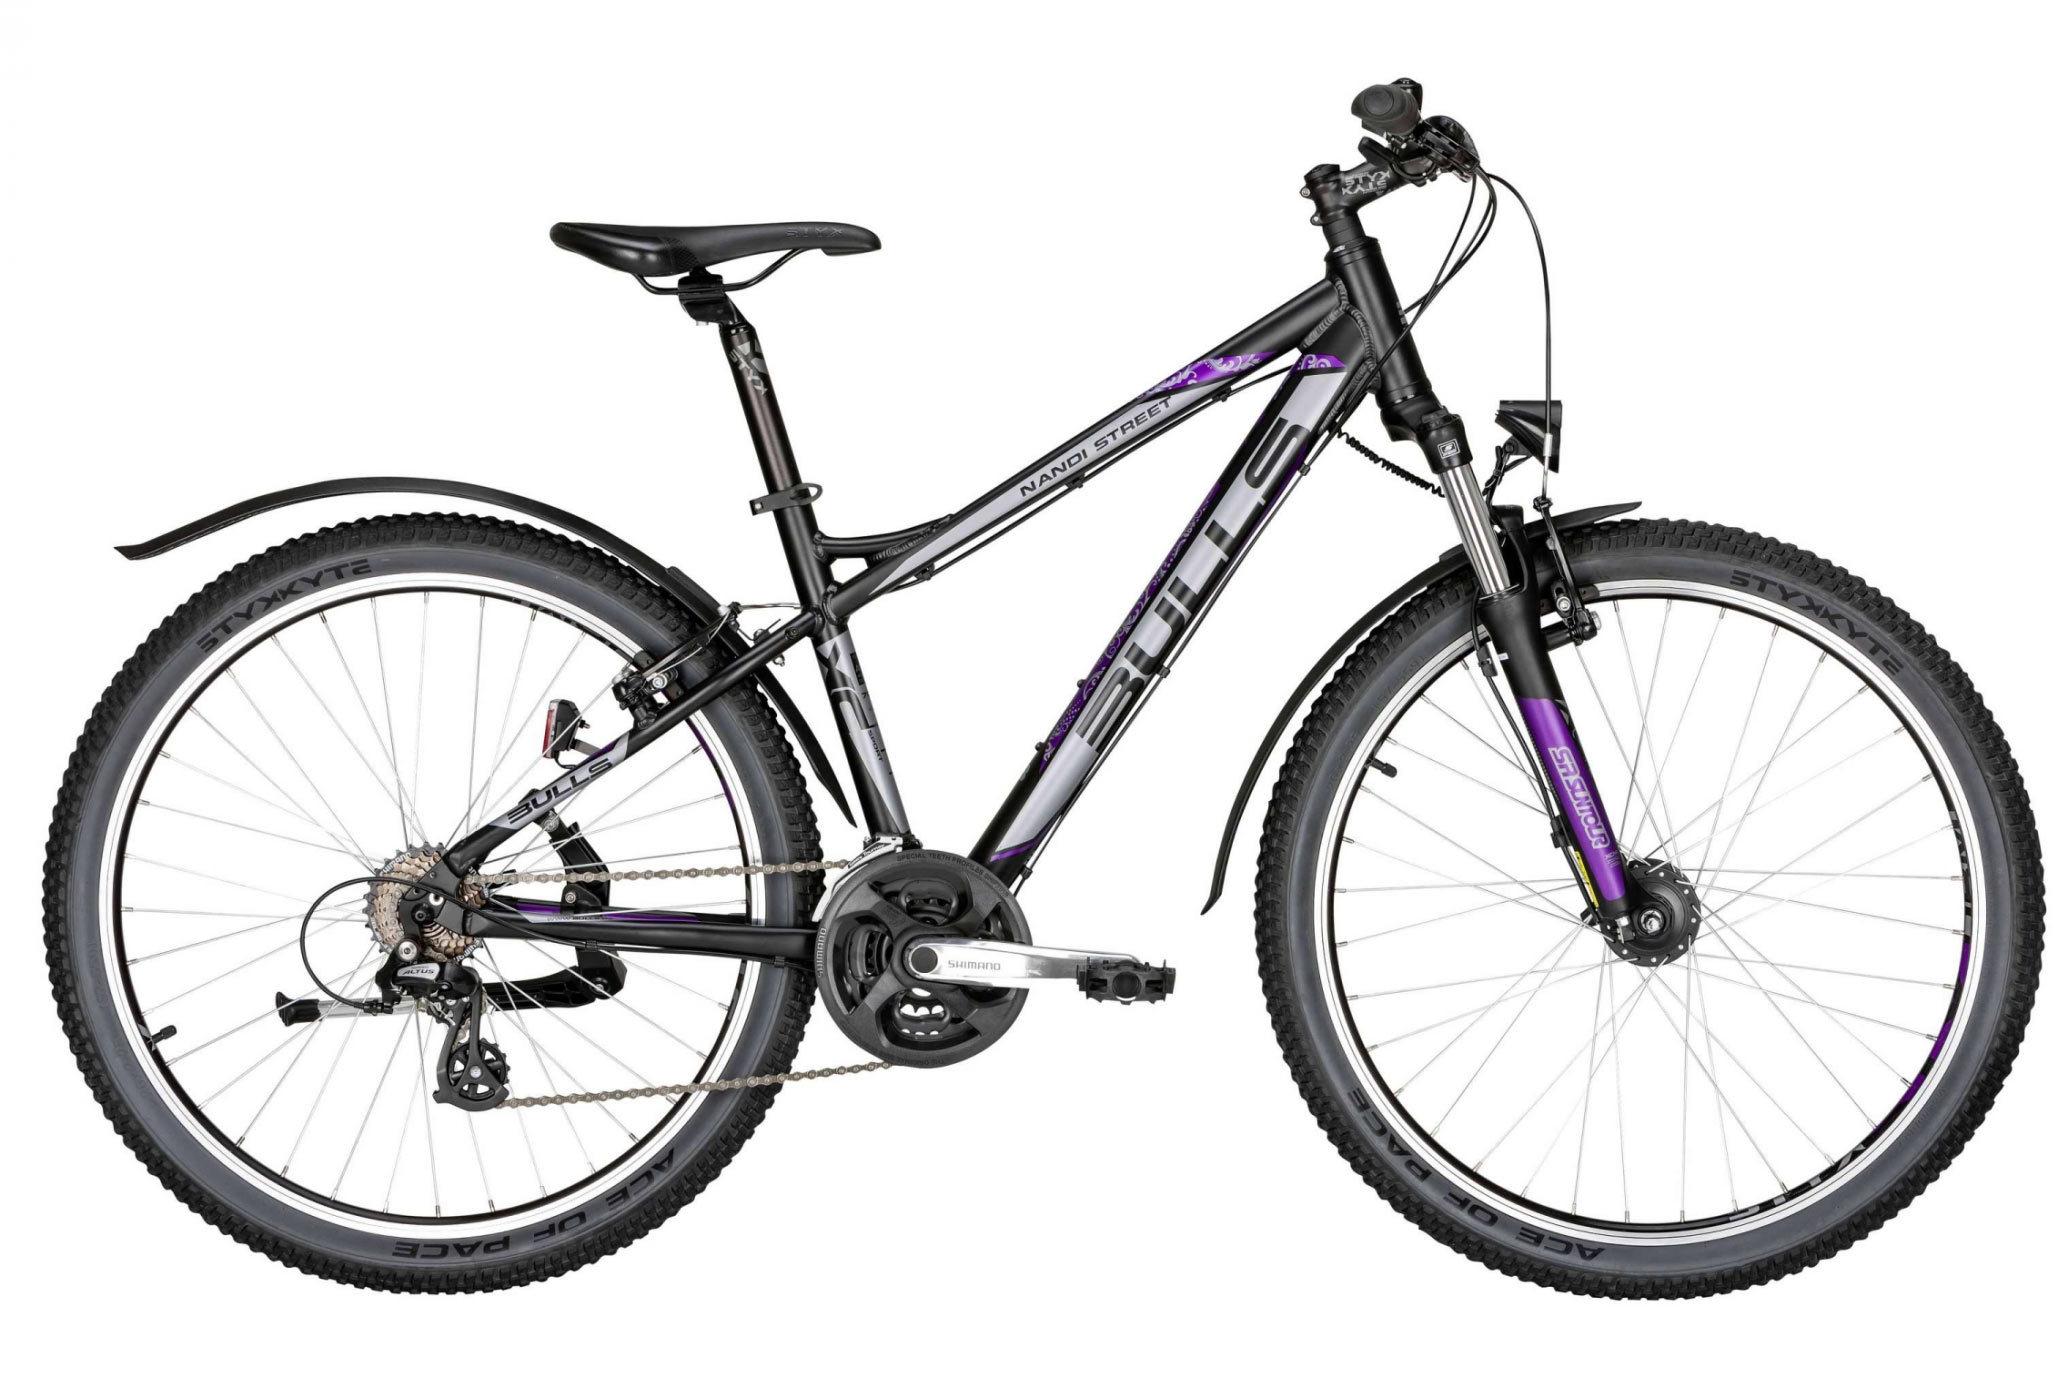 damen mountainbike bulls nandi street fahrrad shimano 21g. Black Bedroom Furniture Sets. Home Design Ideas